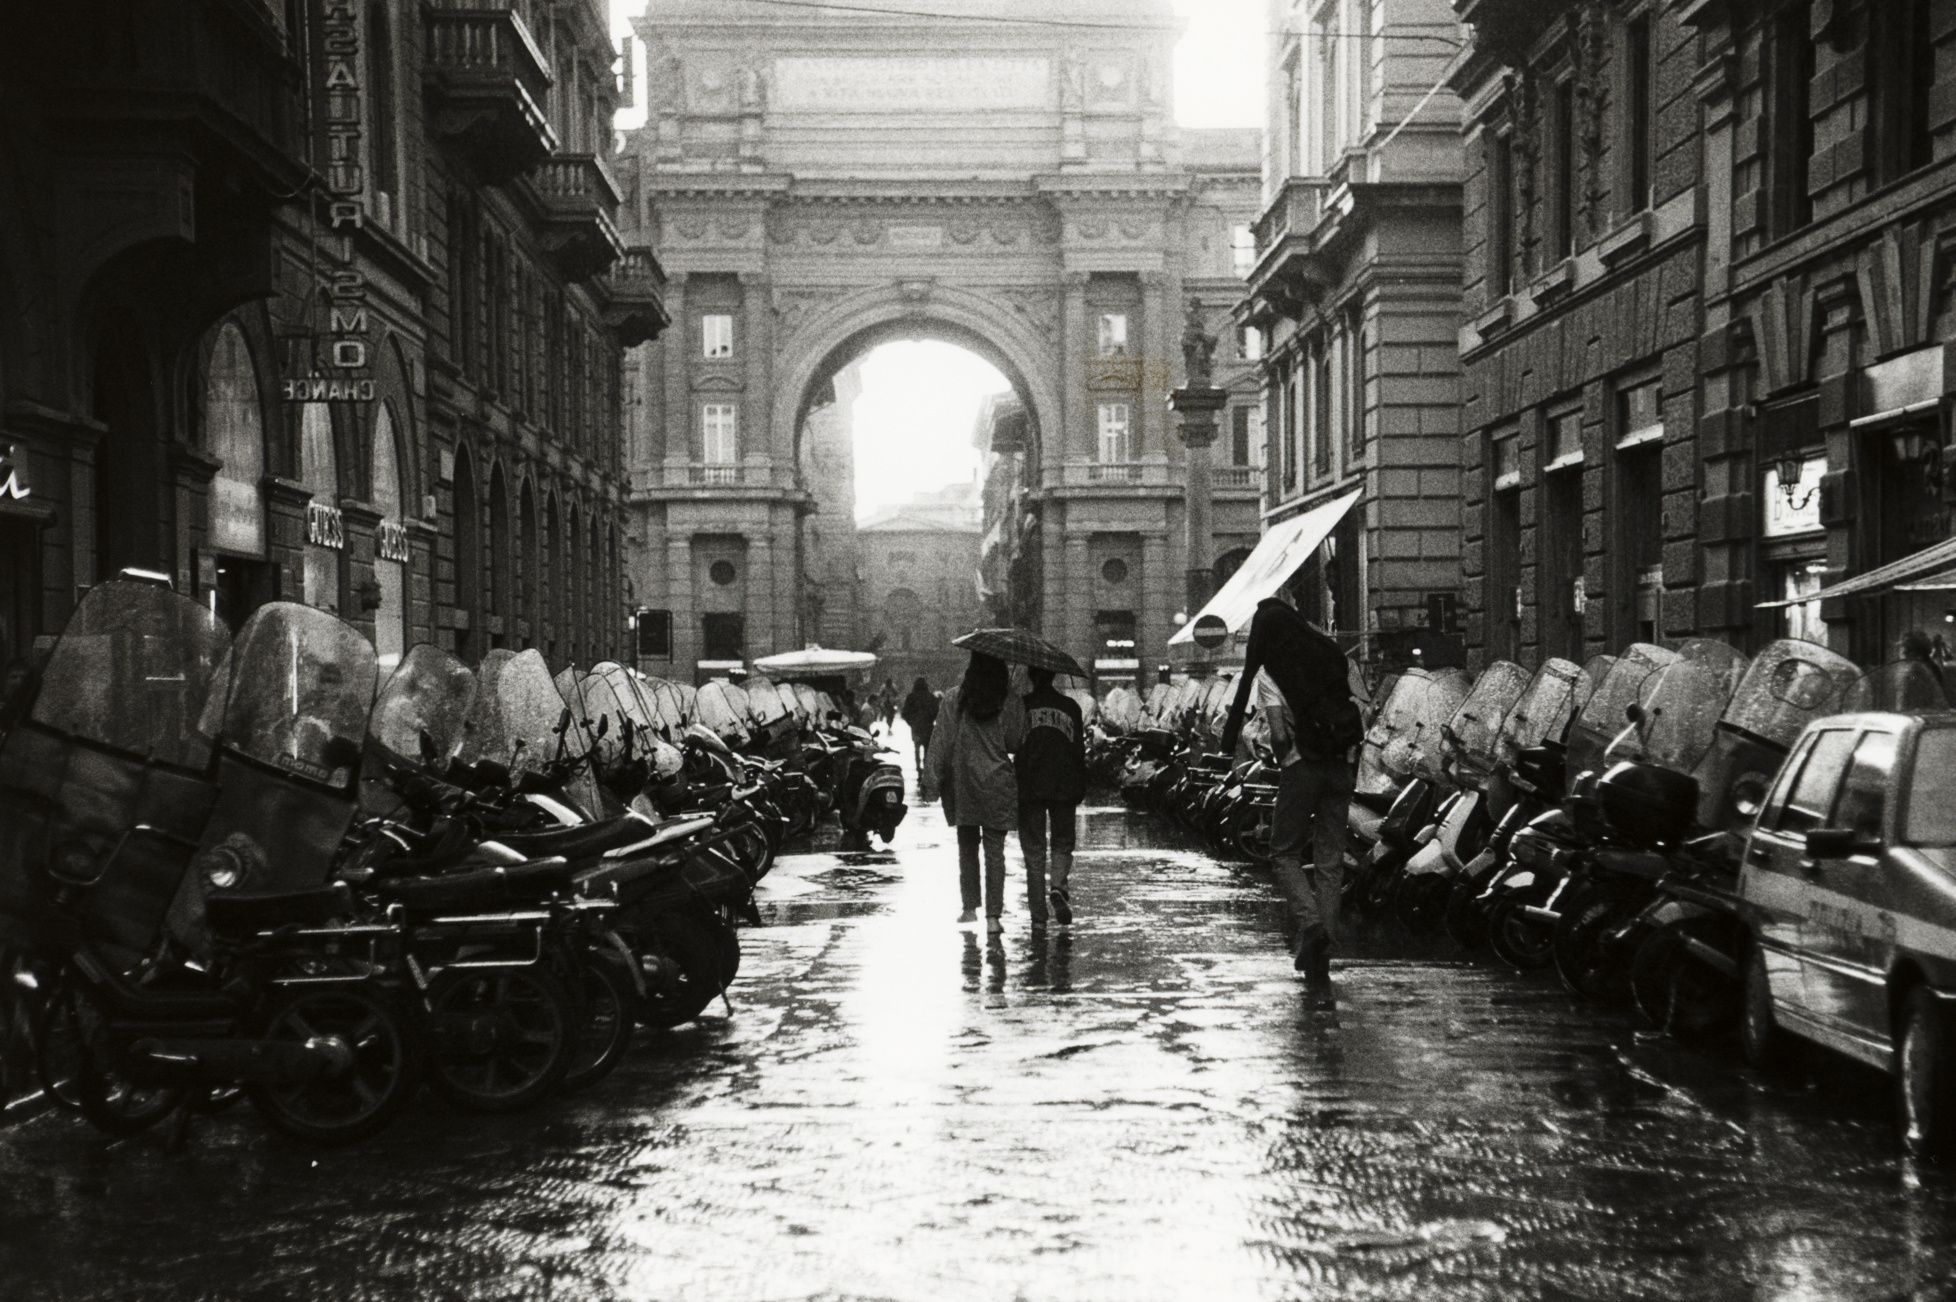 Romance of Firenze in the rain